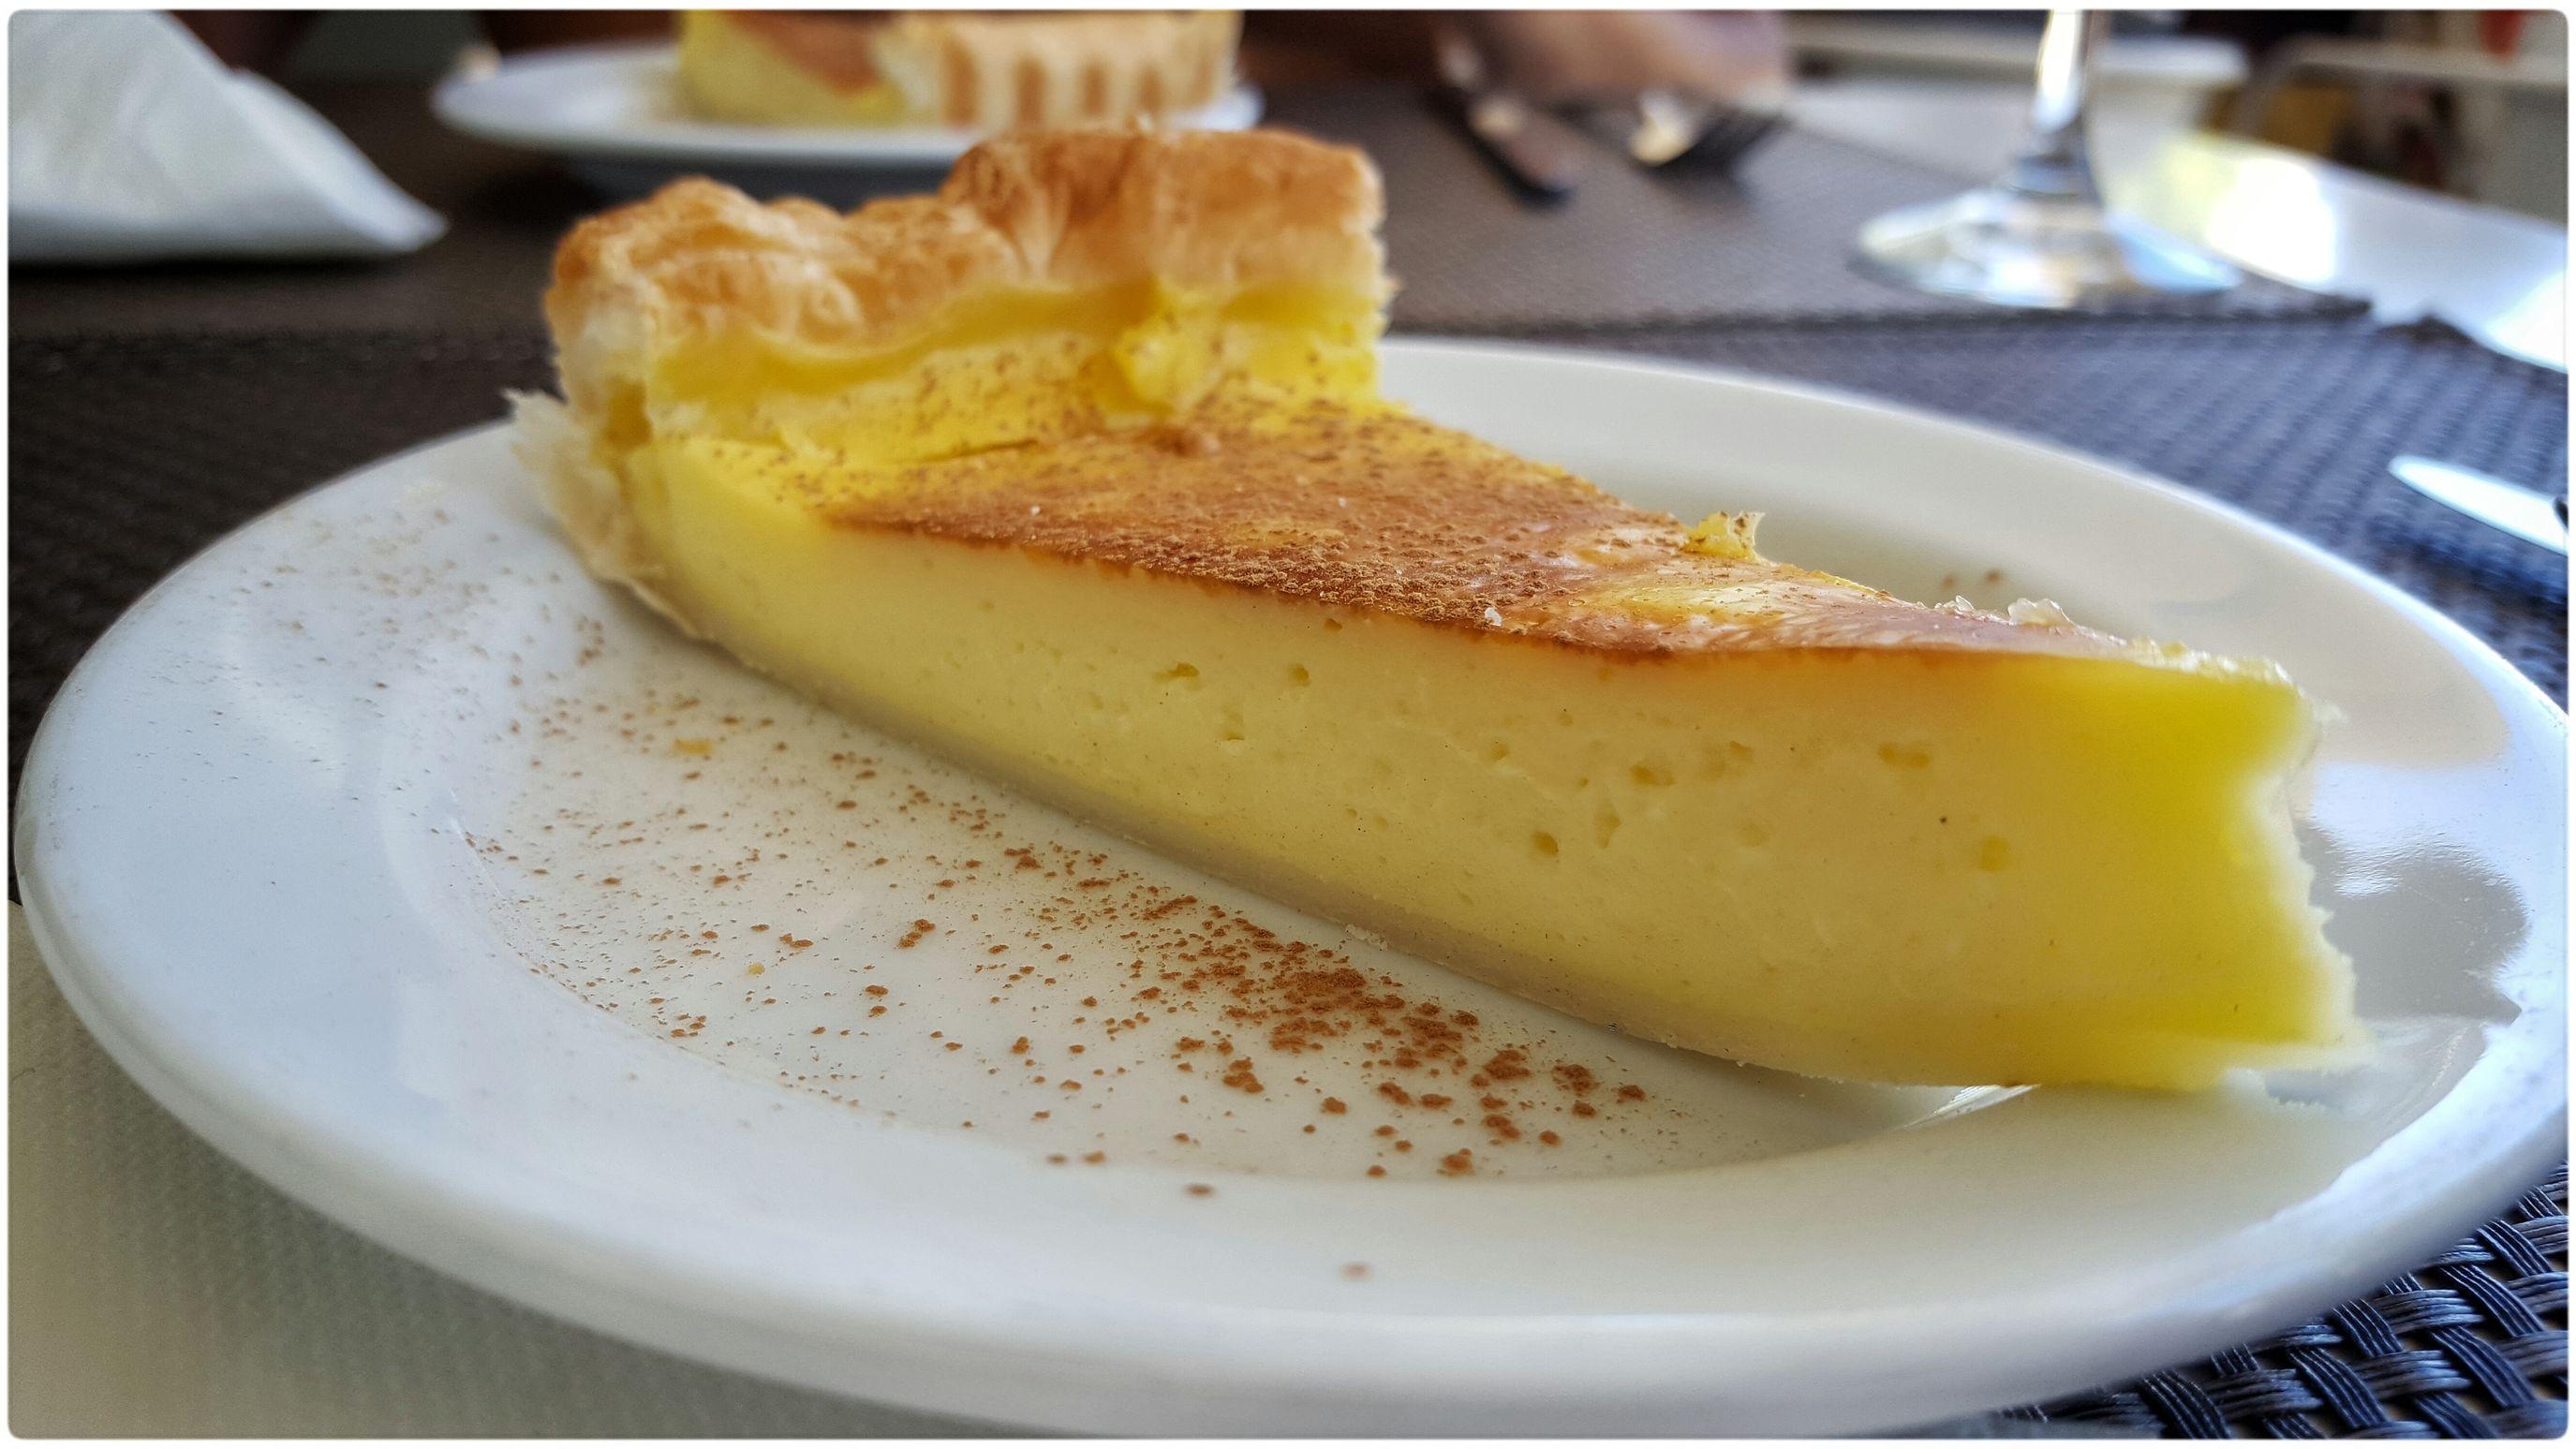 Foodie Dessert Foodporn Leitaria